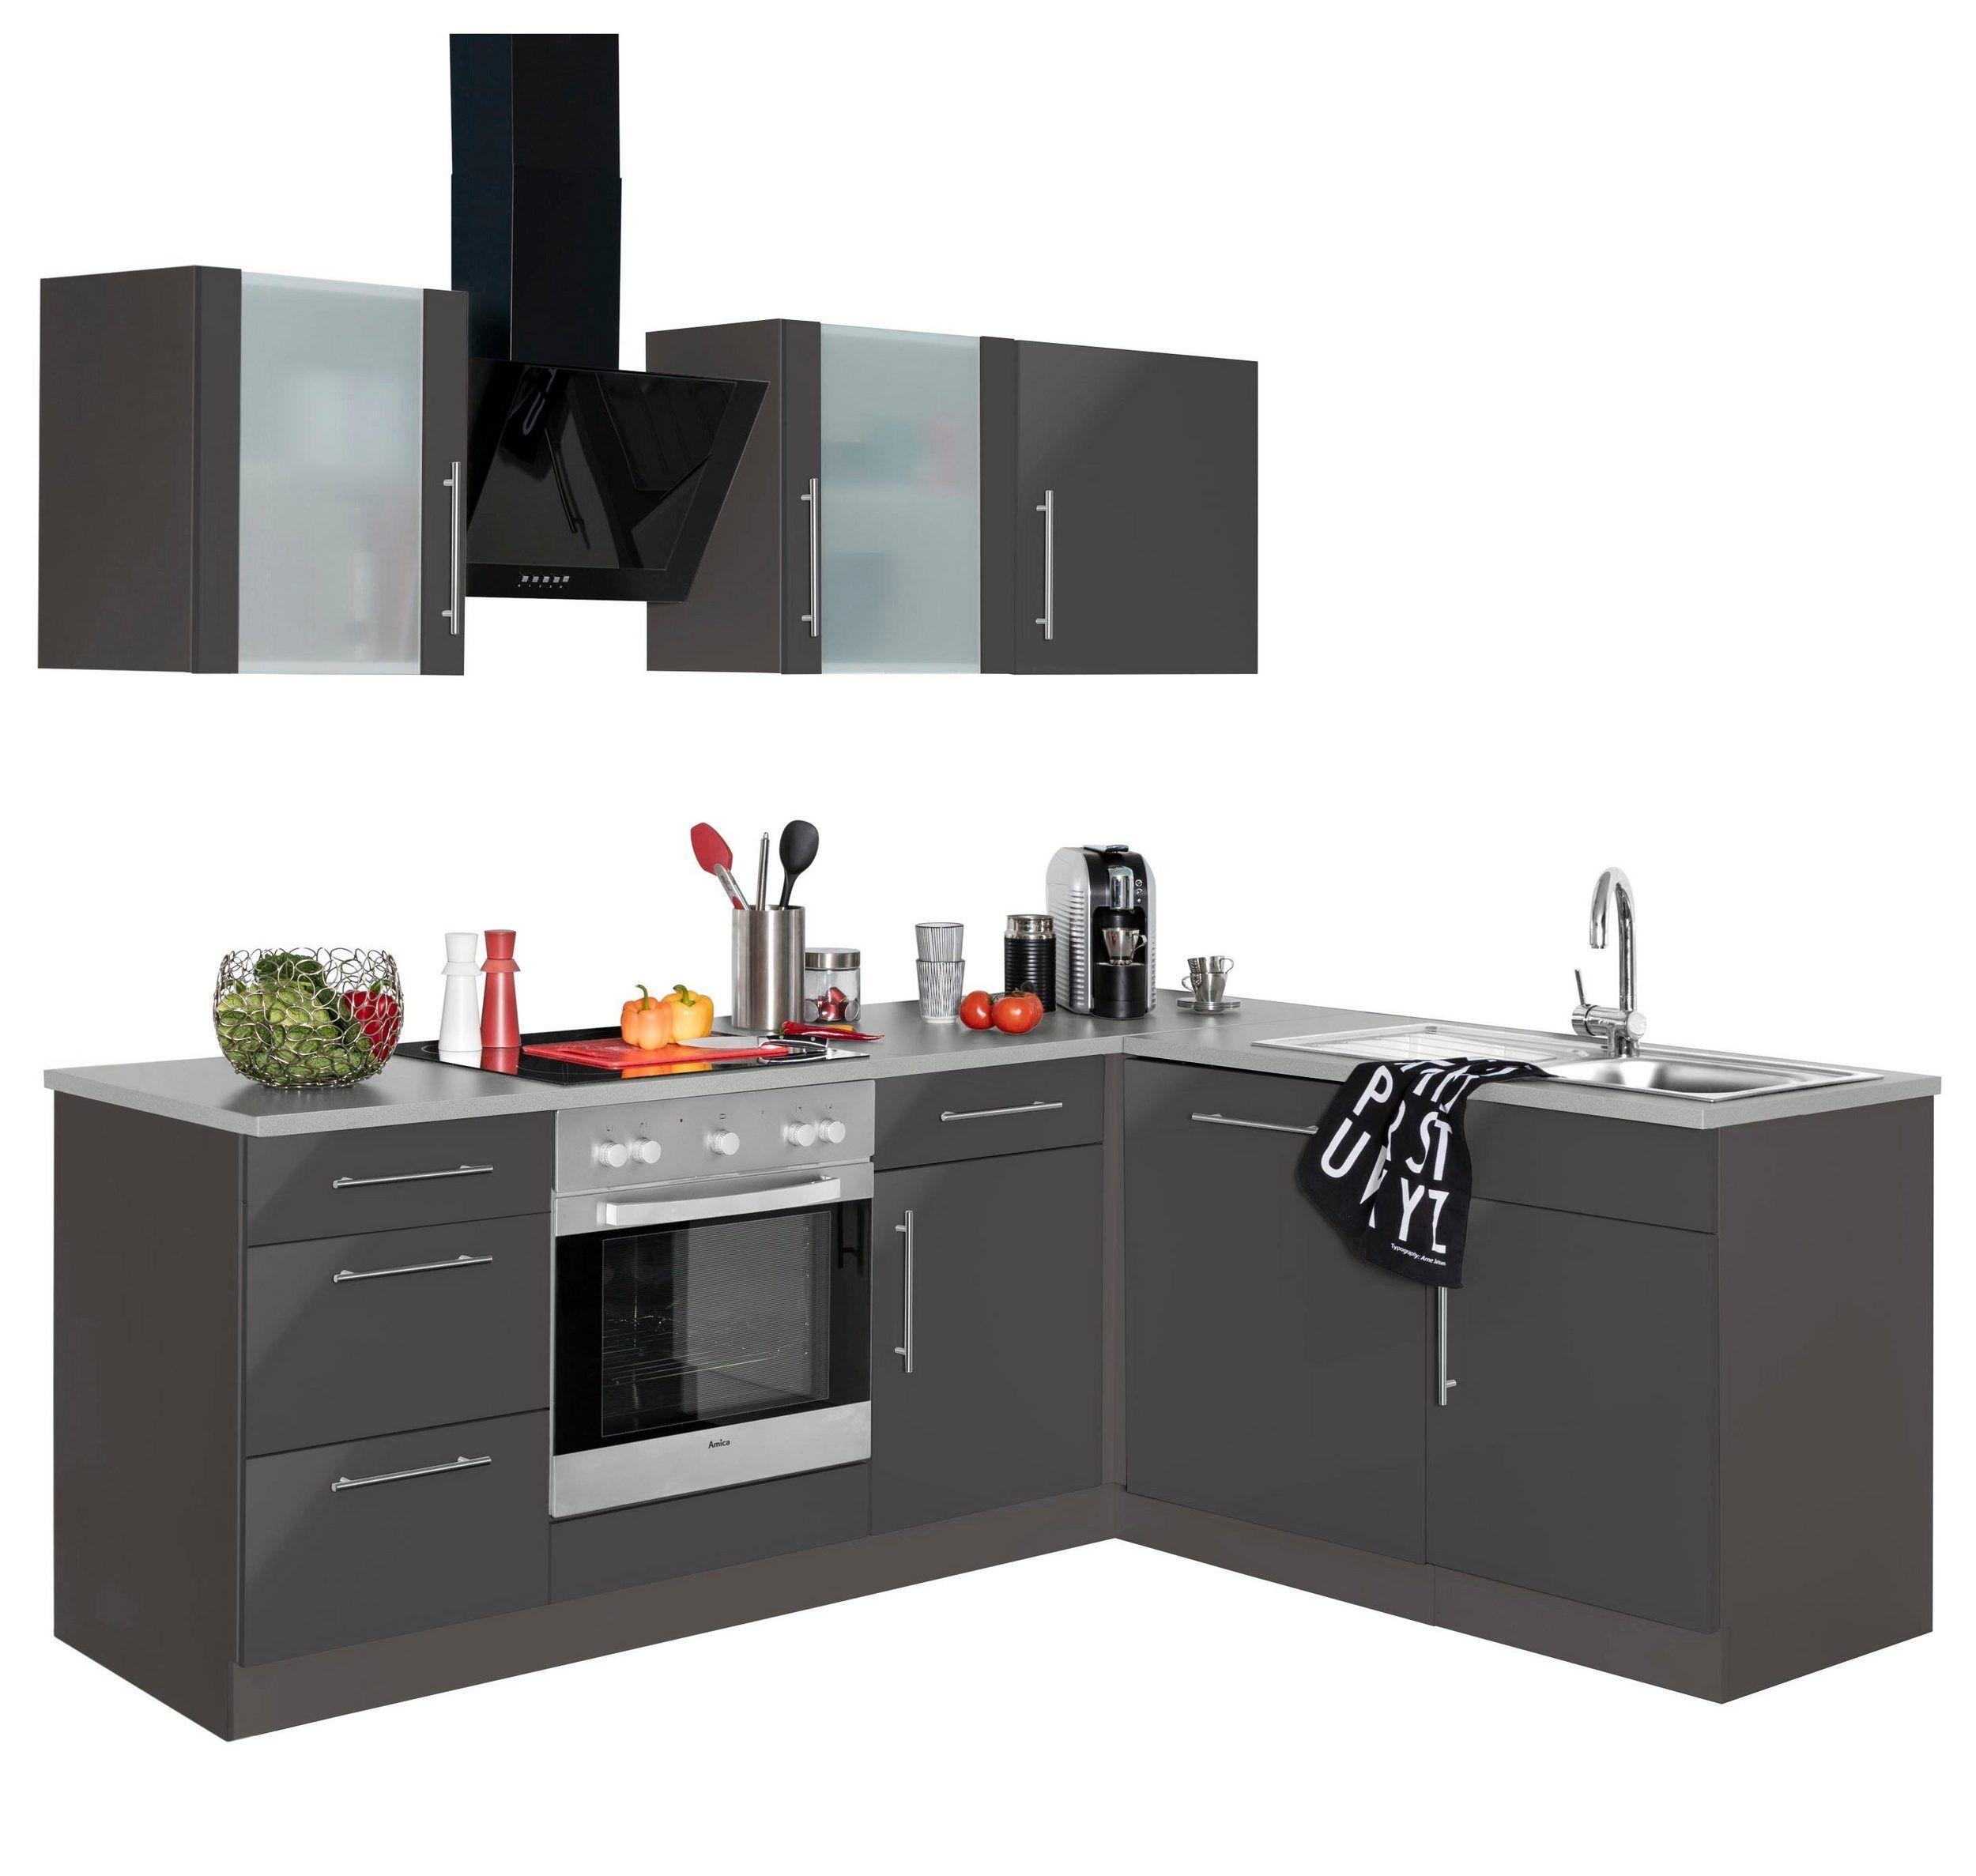 Kitchen Cabinet L Shape Dk 21930 Home Kitchens Kitchen Cabinets Kitchen Furniture